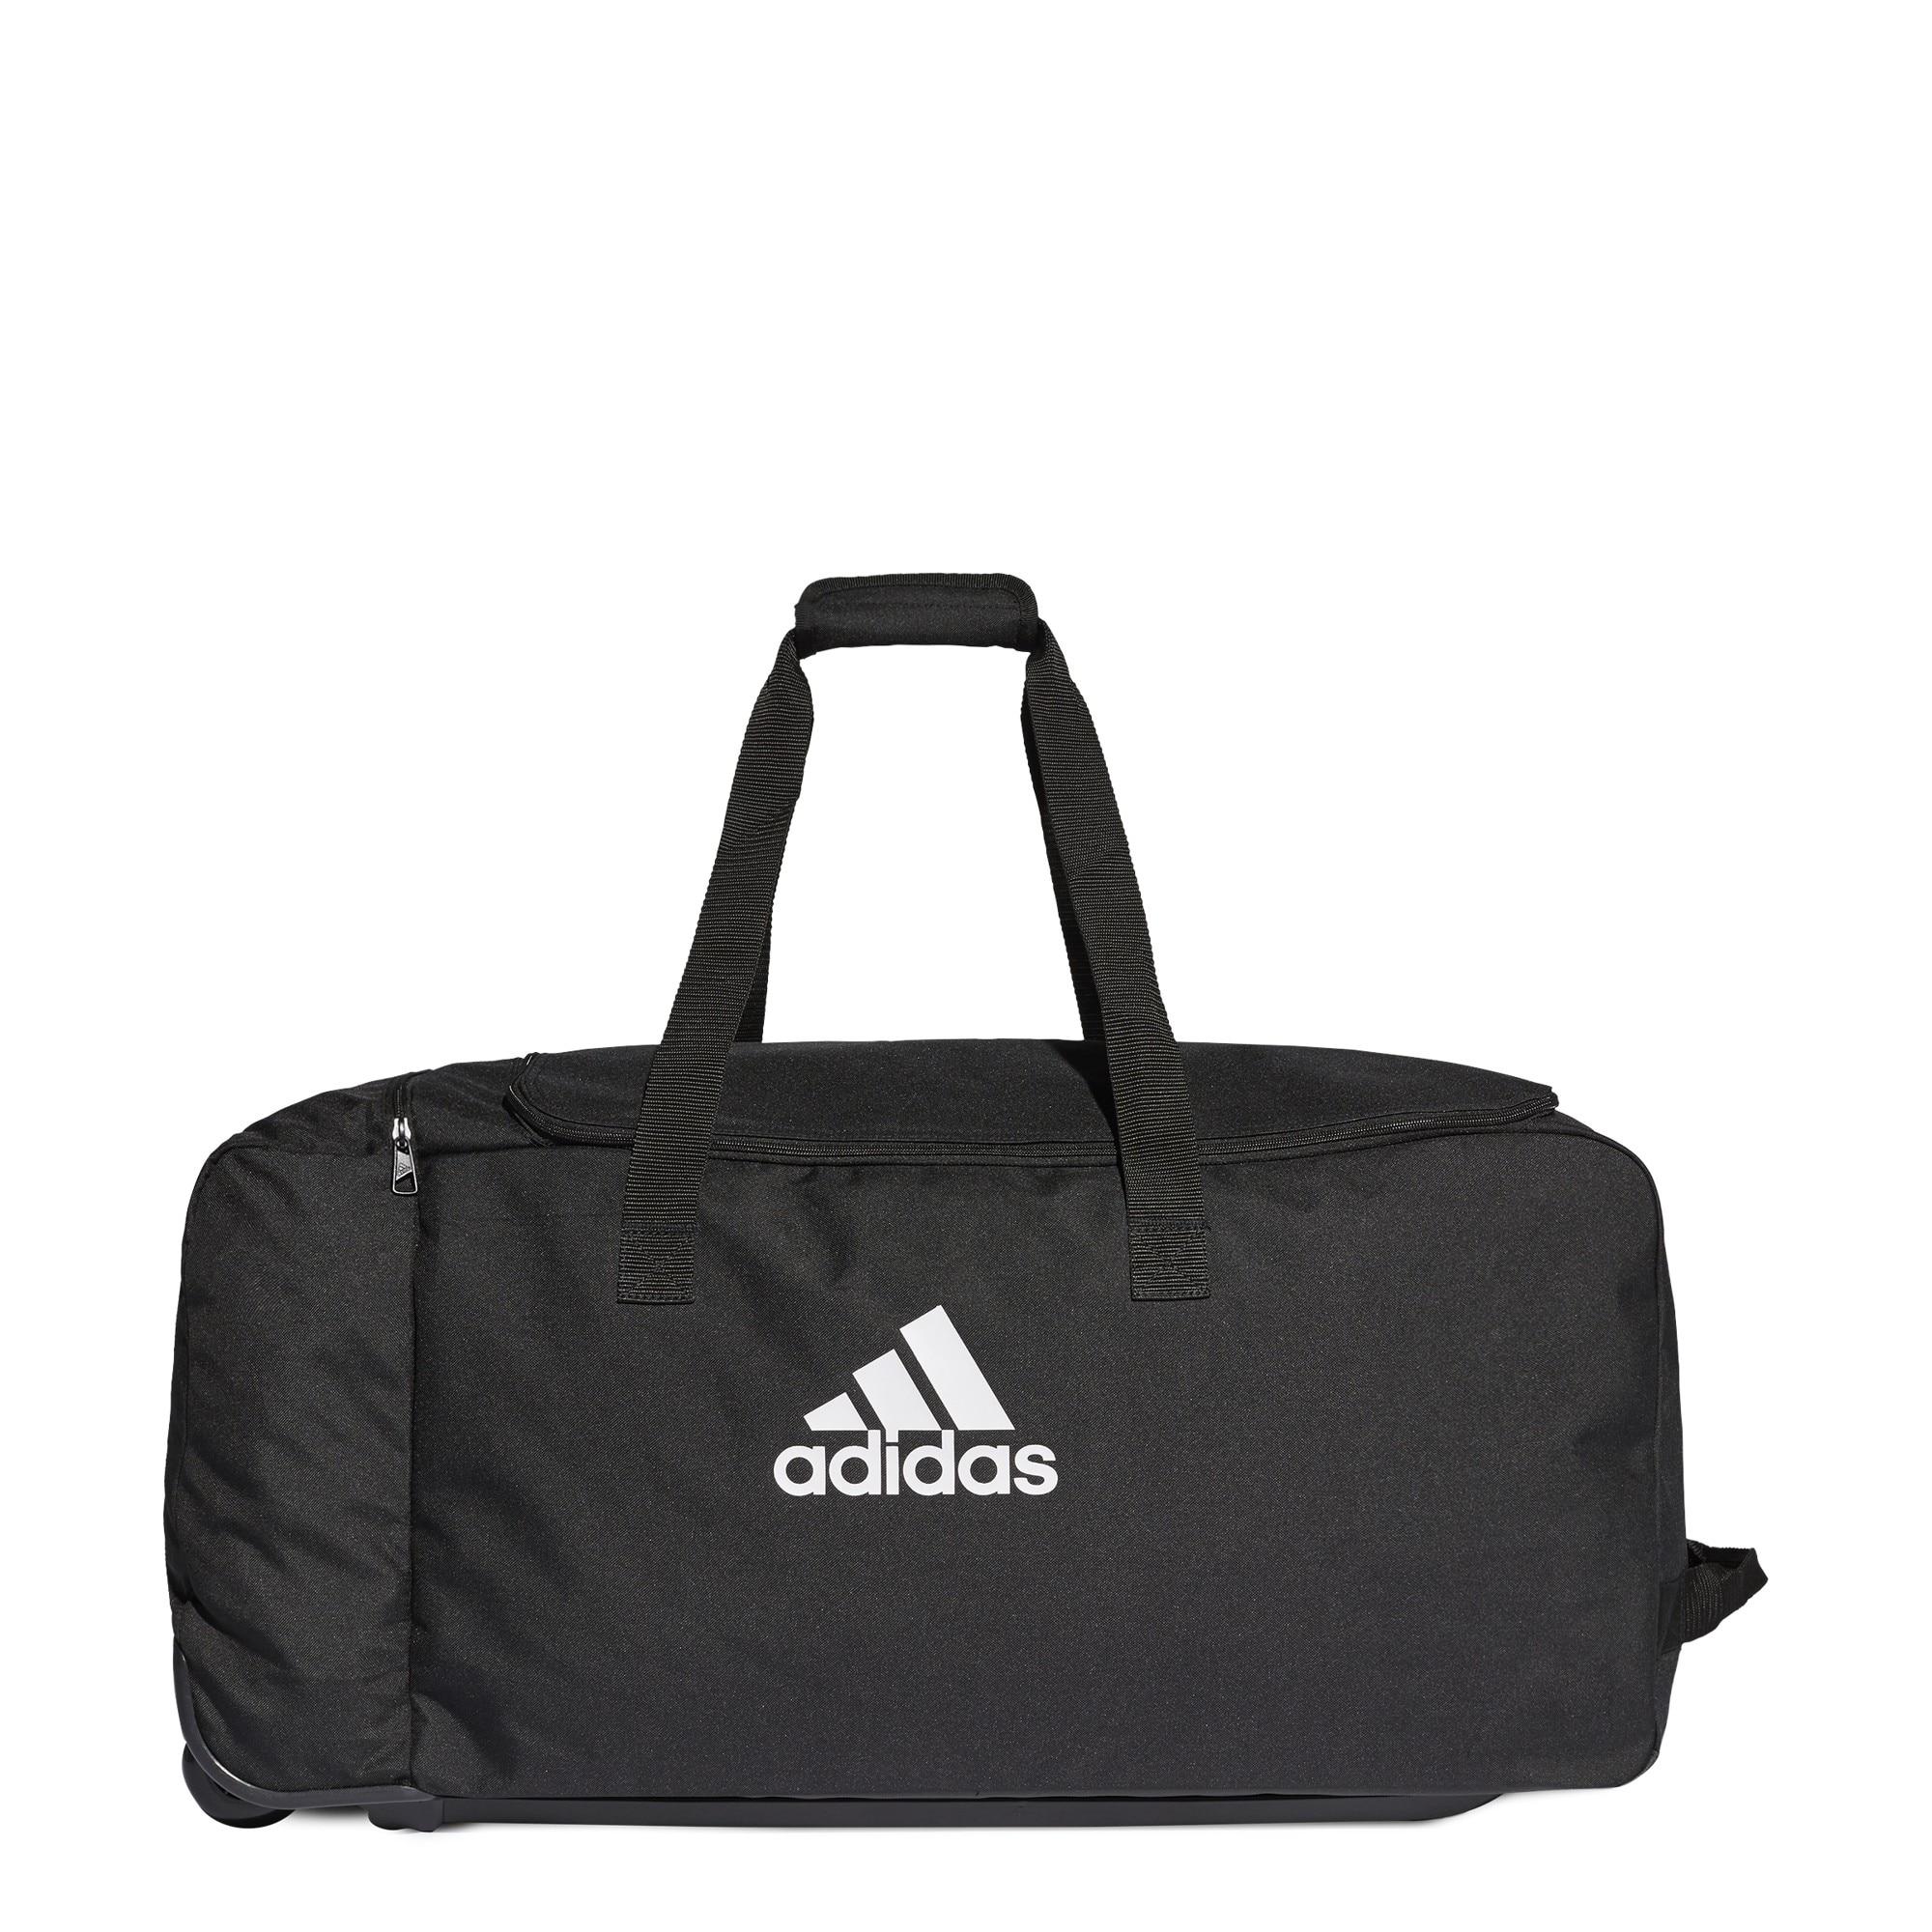 Adidas Tiro 19 Dufffle Fotballbag XL